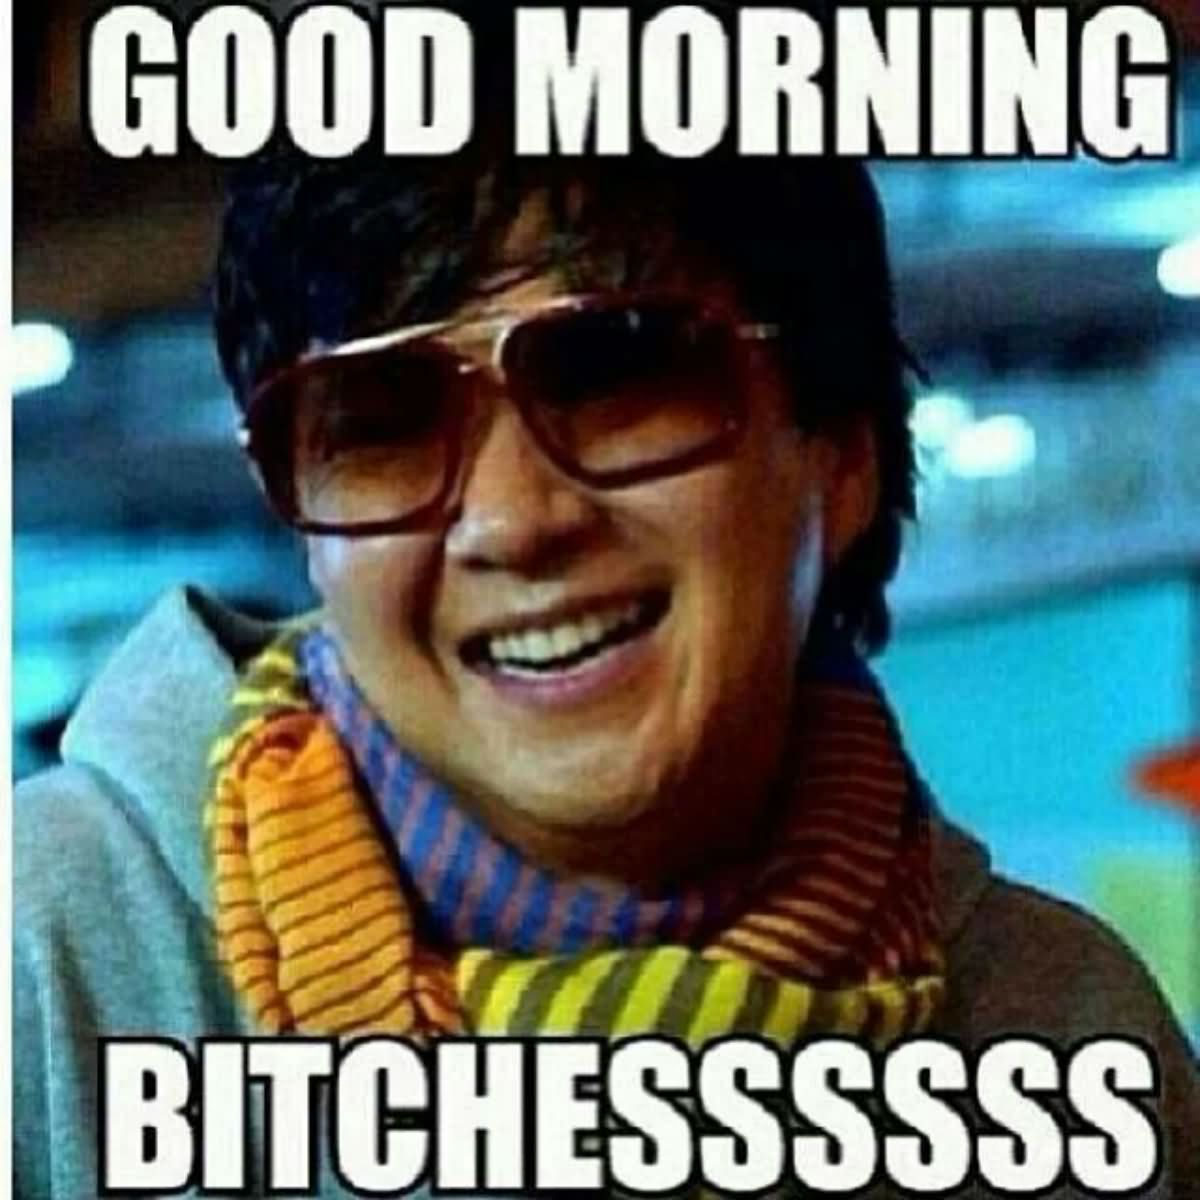 Good morning bitchiness Good Morning Meme